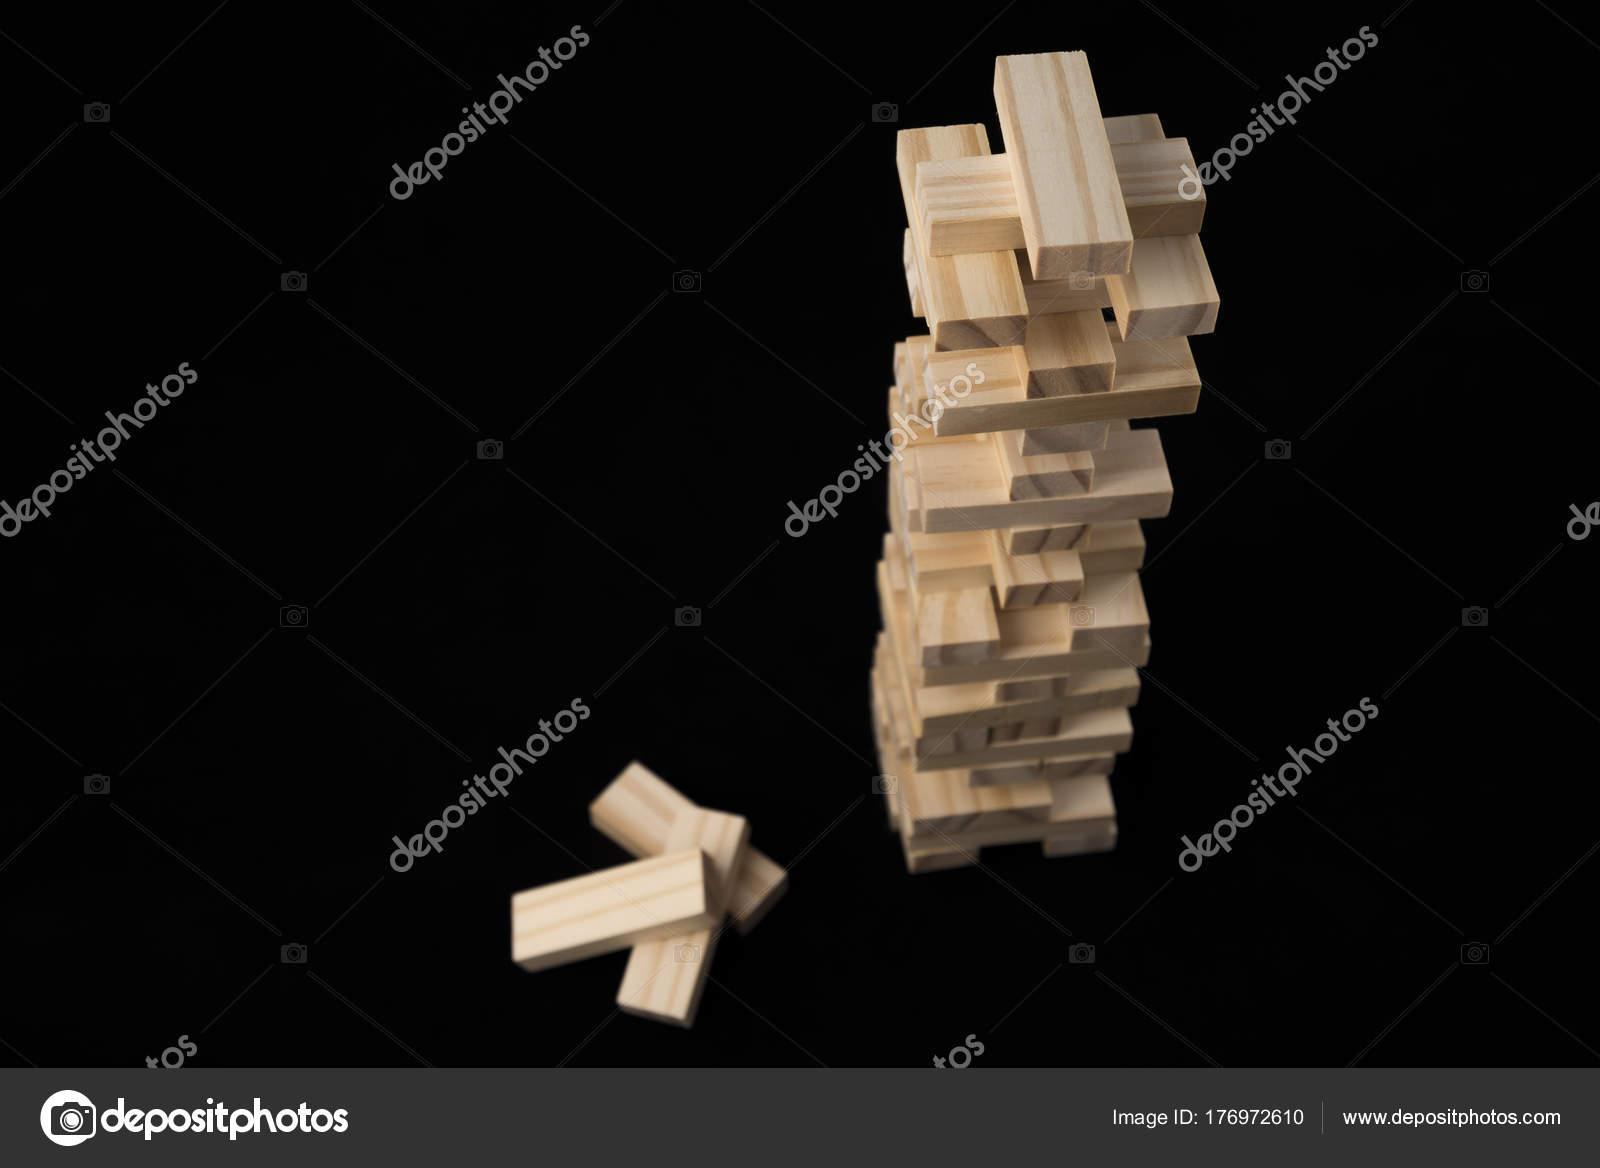 Tower Wooden Blocks Toy Black Background Learning Development